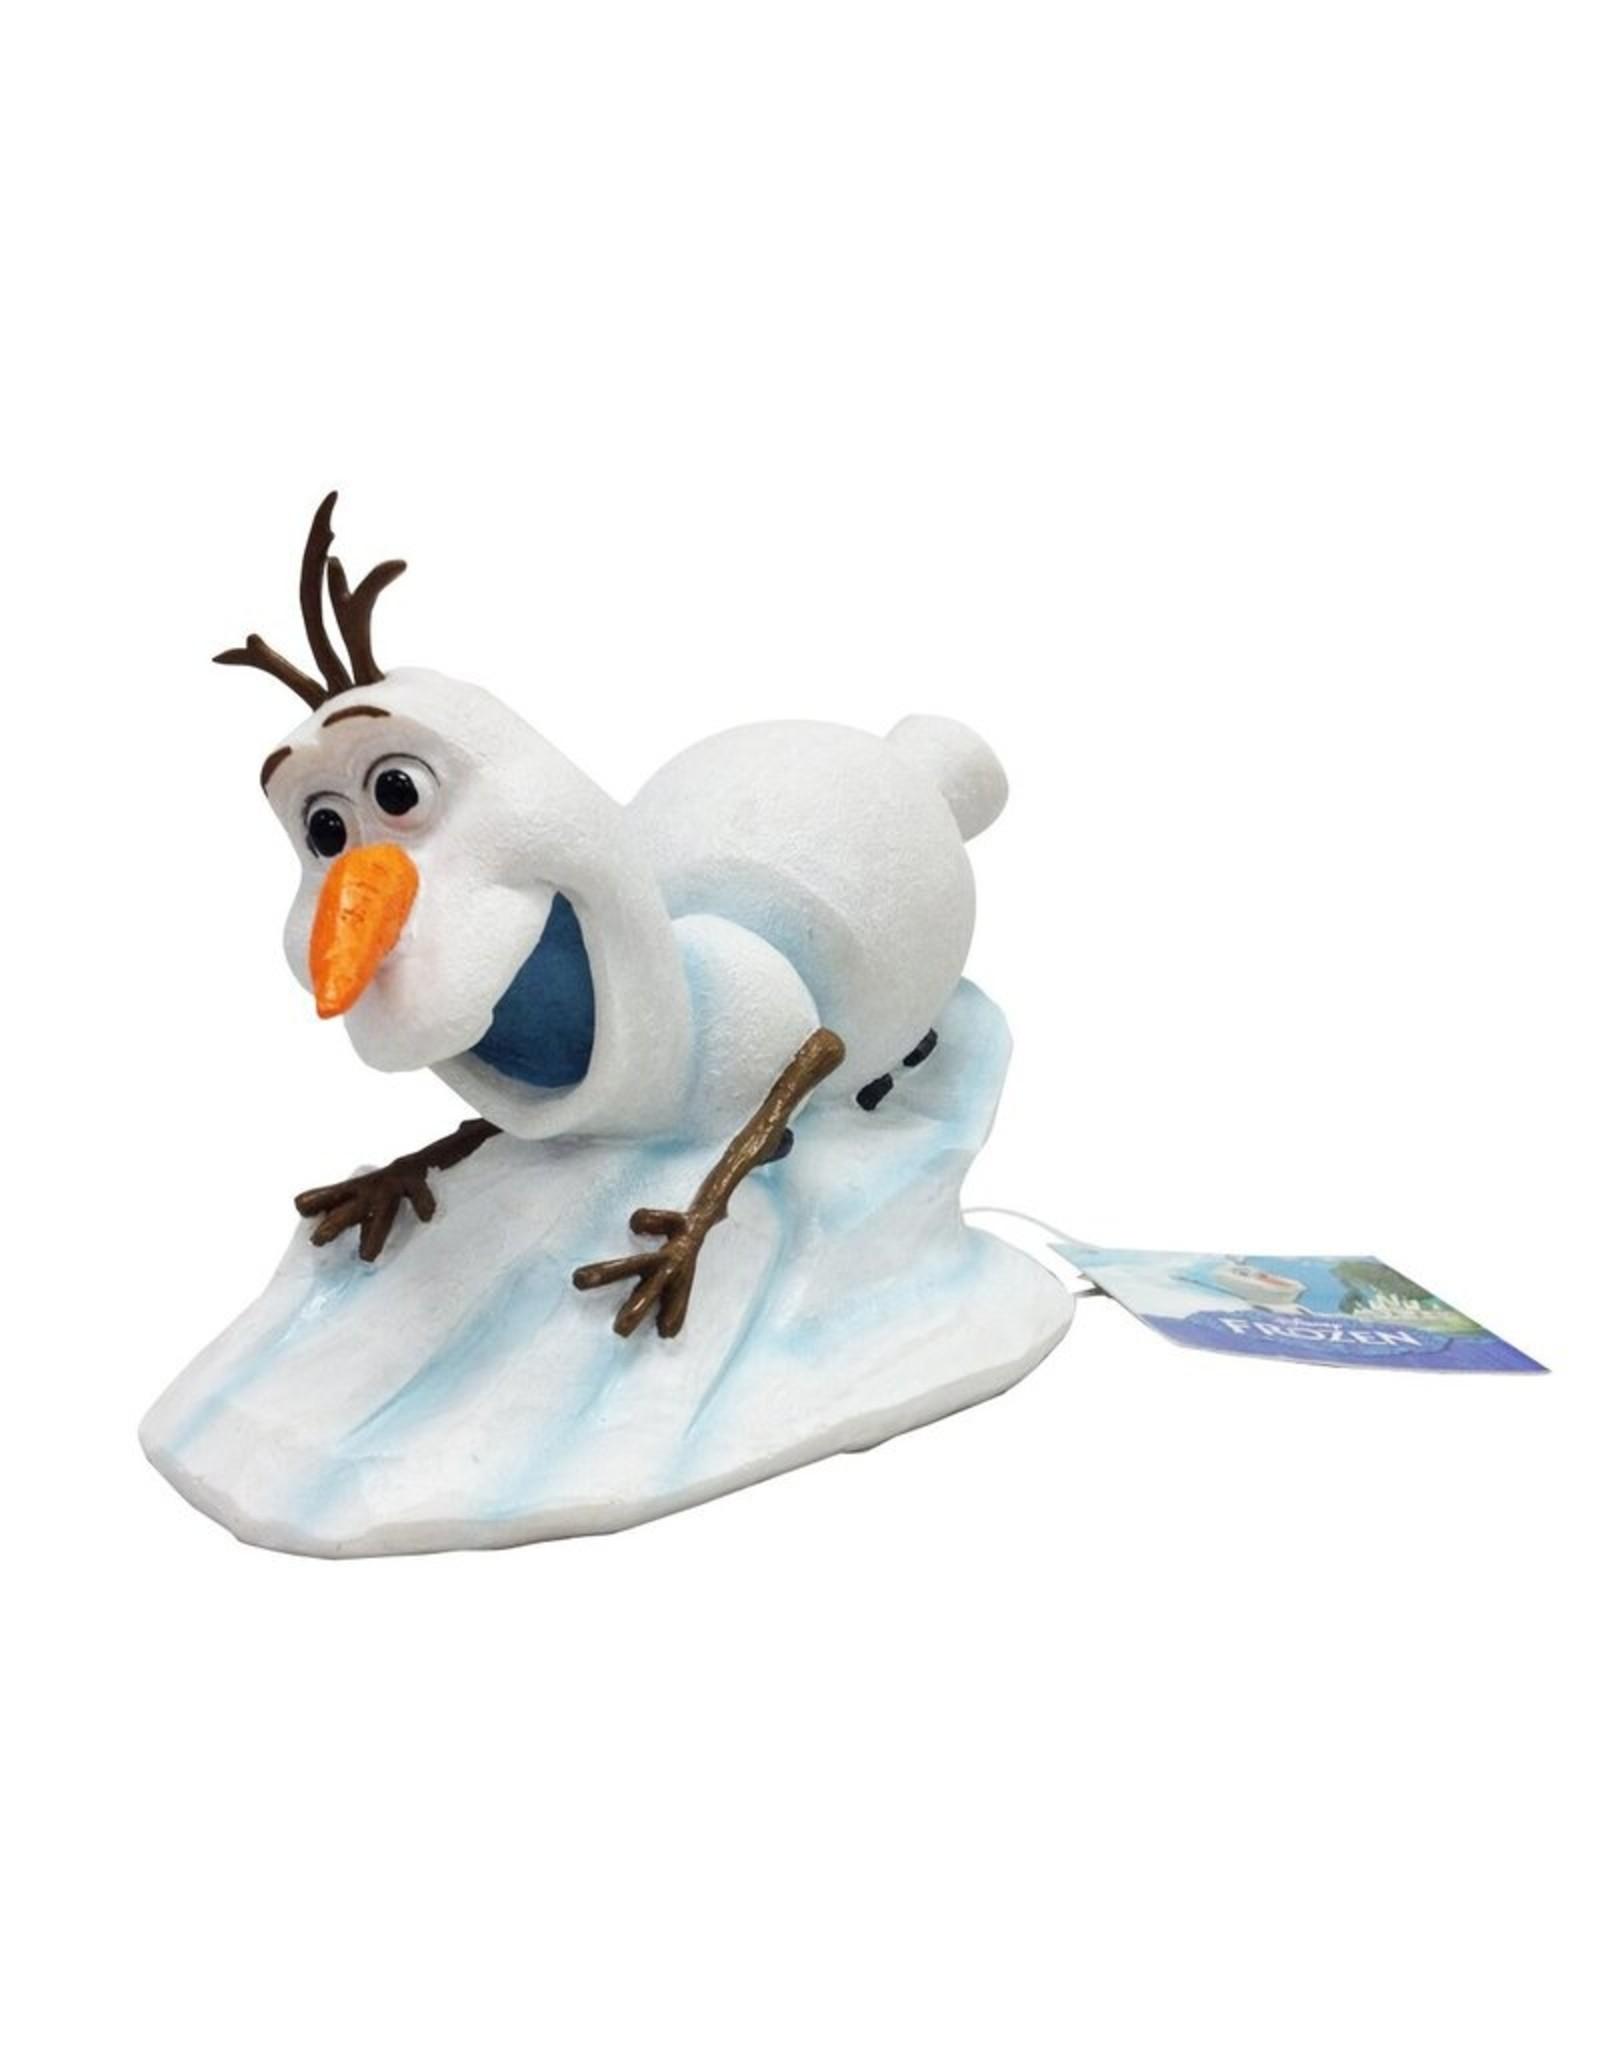 Penn Plax DISNEY Frozen Olaf Sliding Down